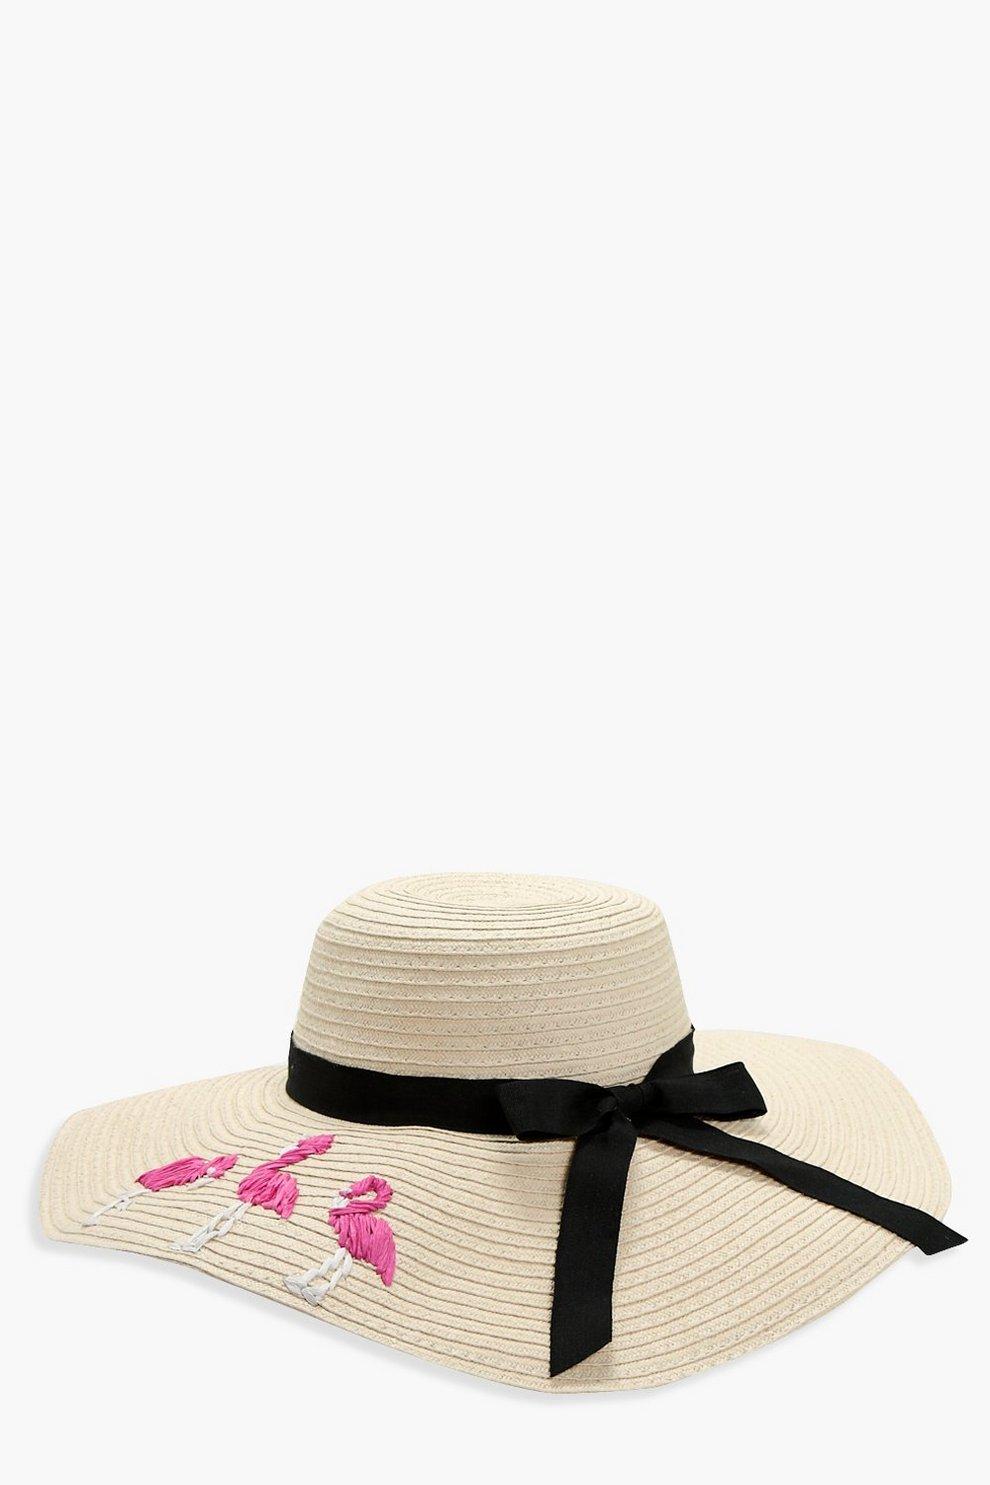 Sarah Flamingo Straw Floppy Hat  64d4ad67f7ec